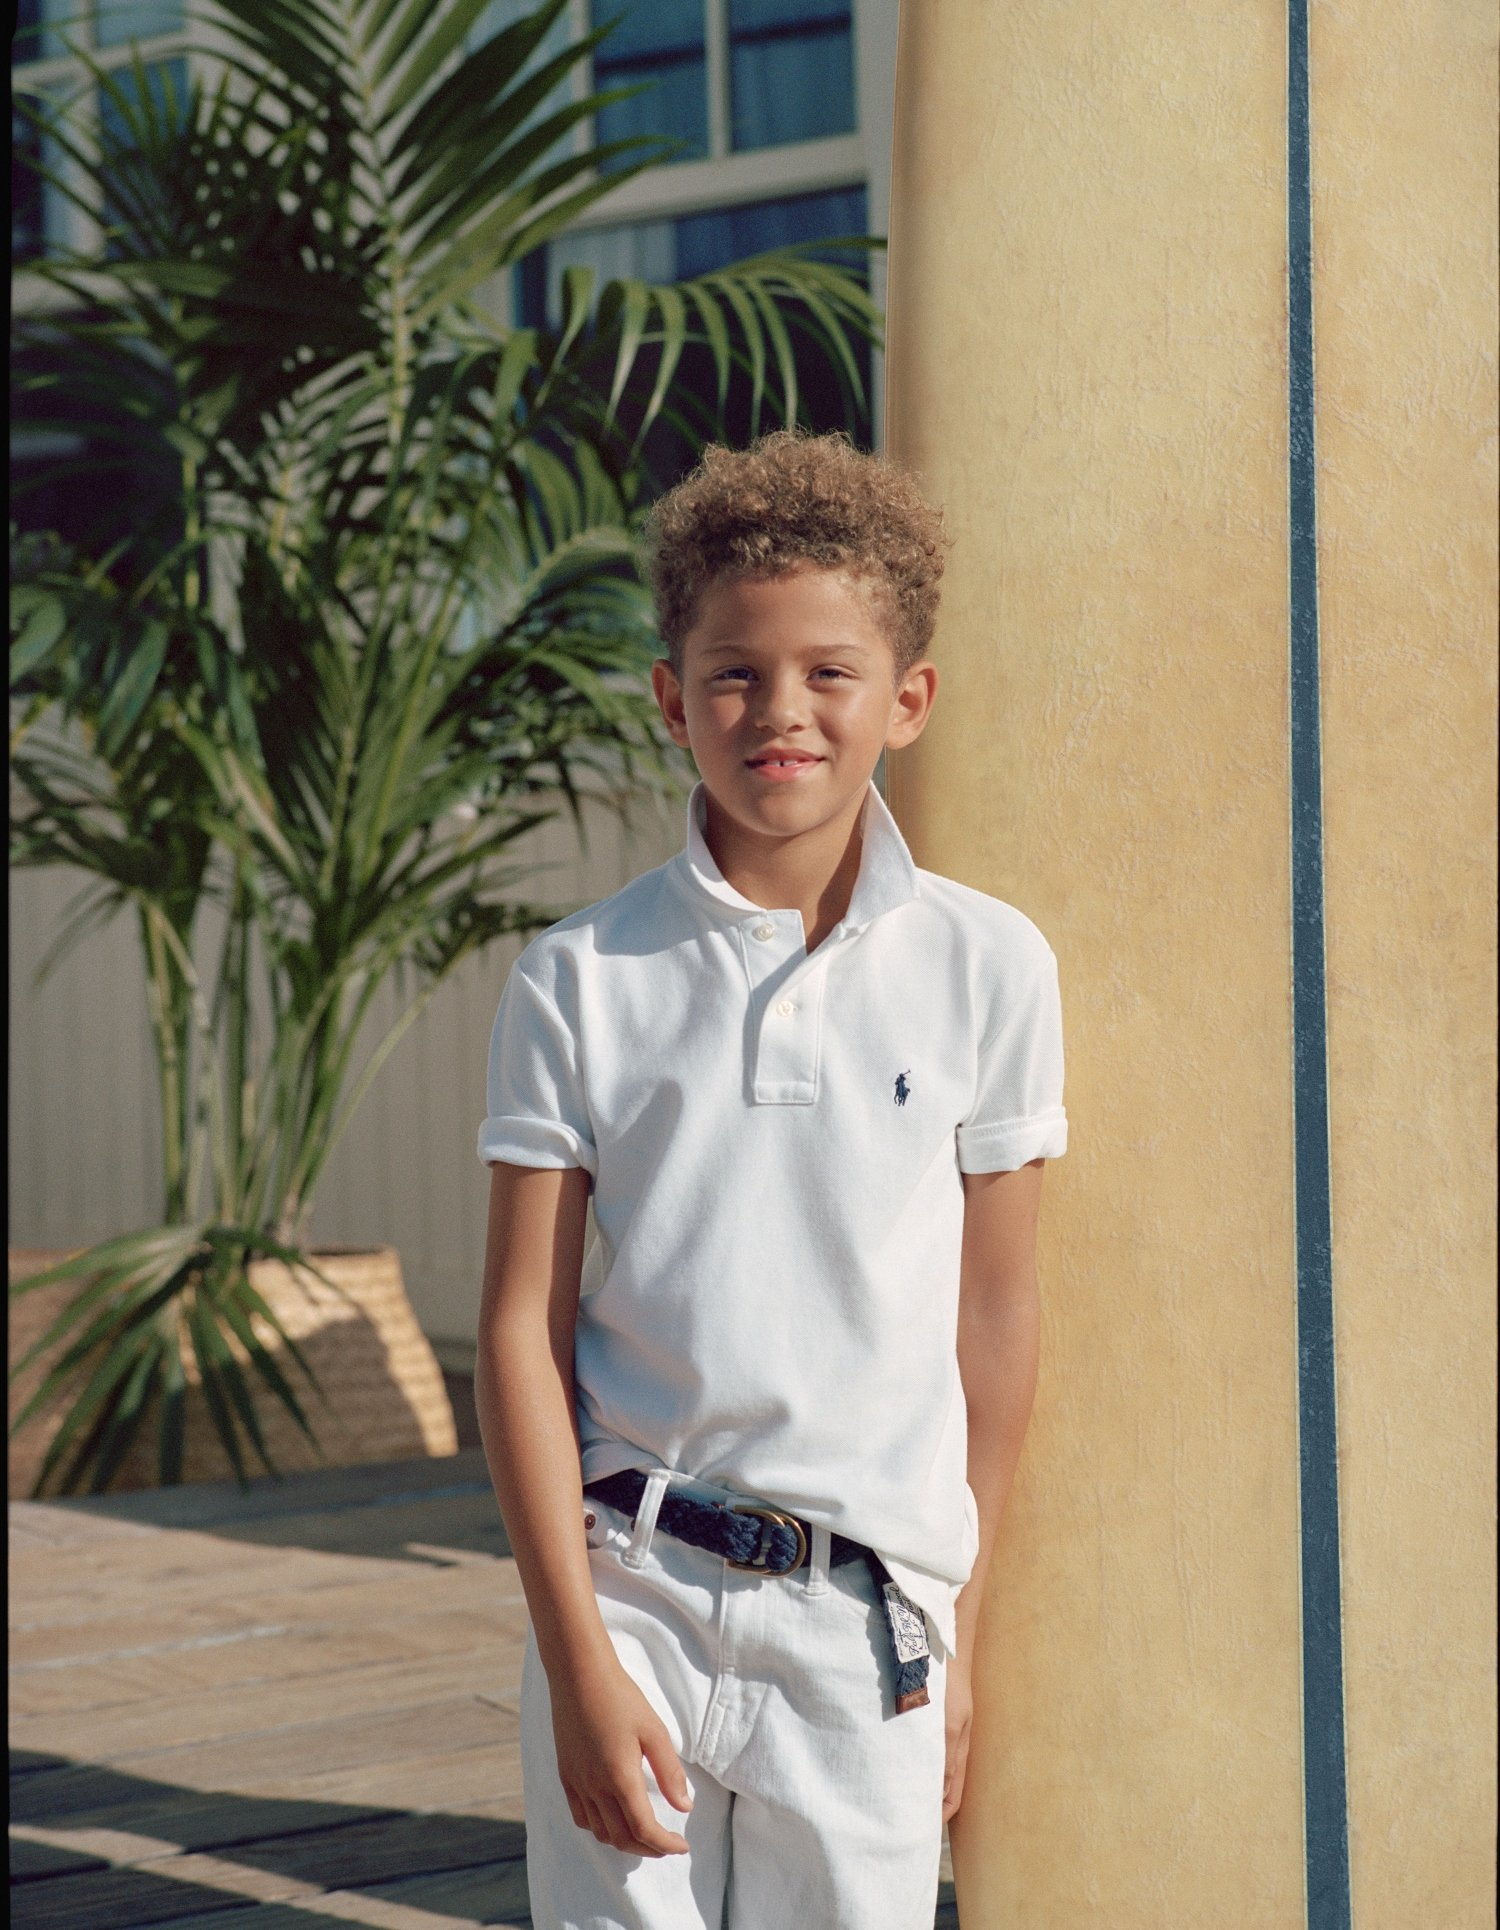 Polo ralph lauren kids clothing